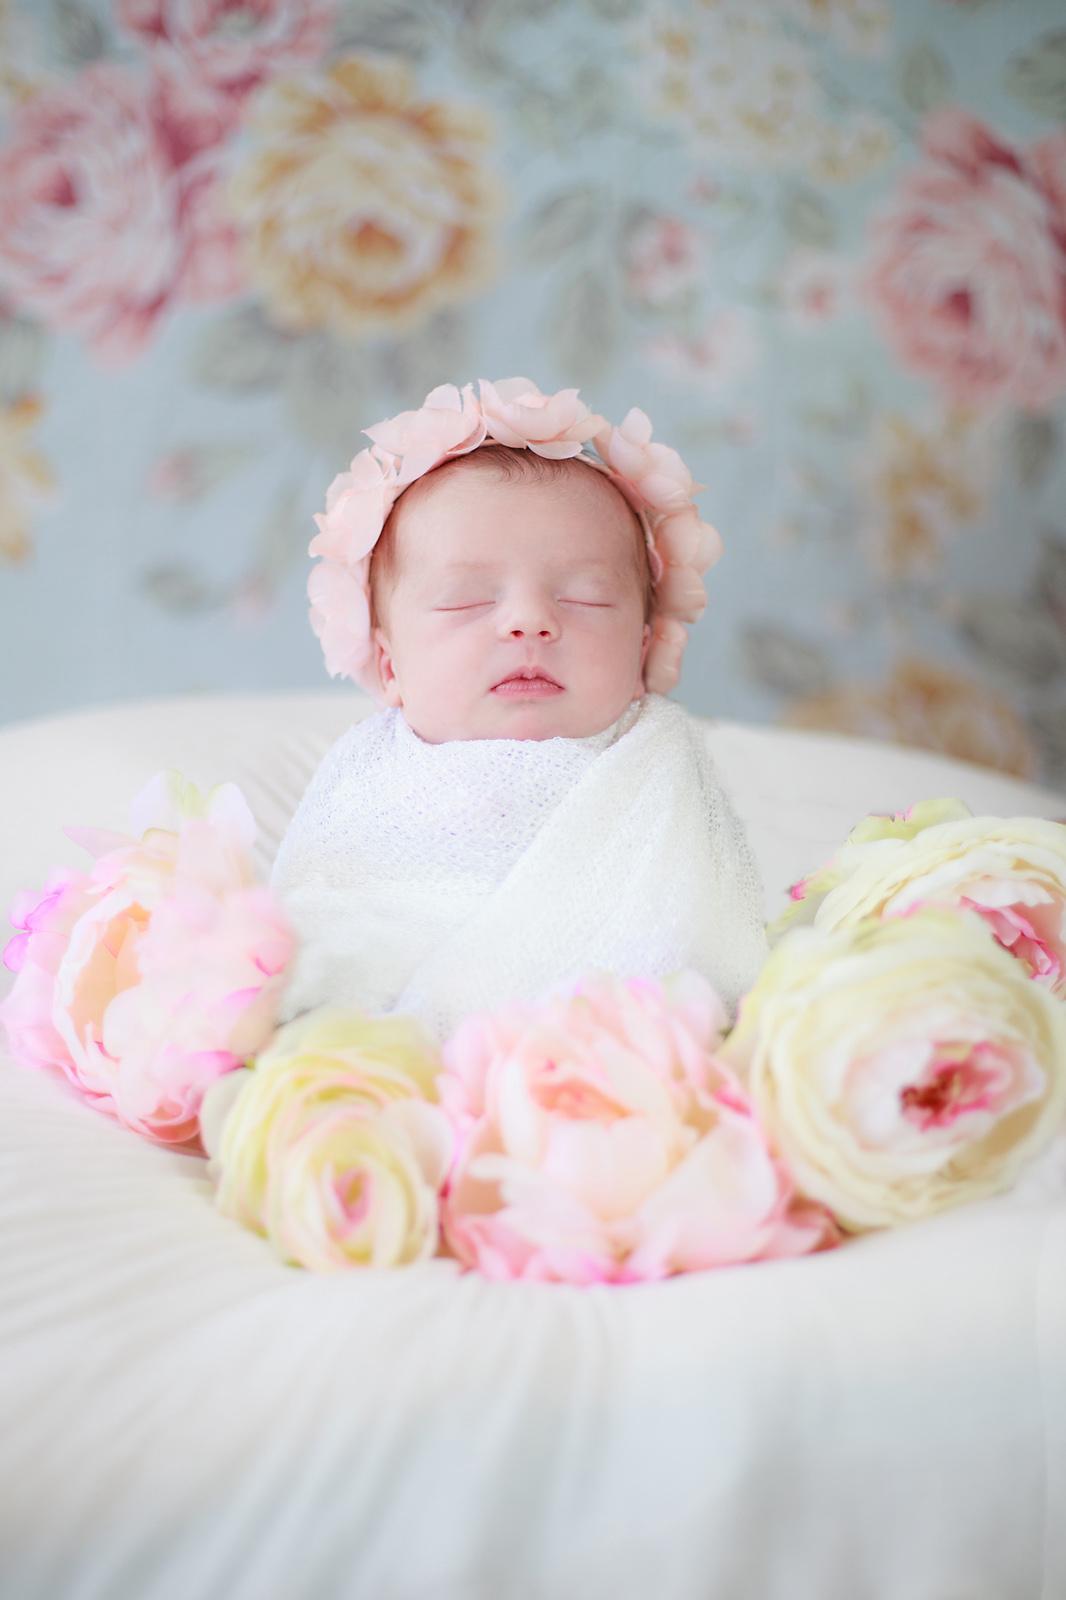 028-newborn-maternity-birth-family-photographer-acton-ma-105